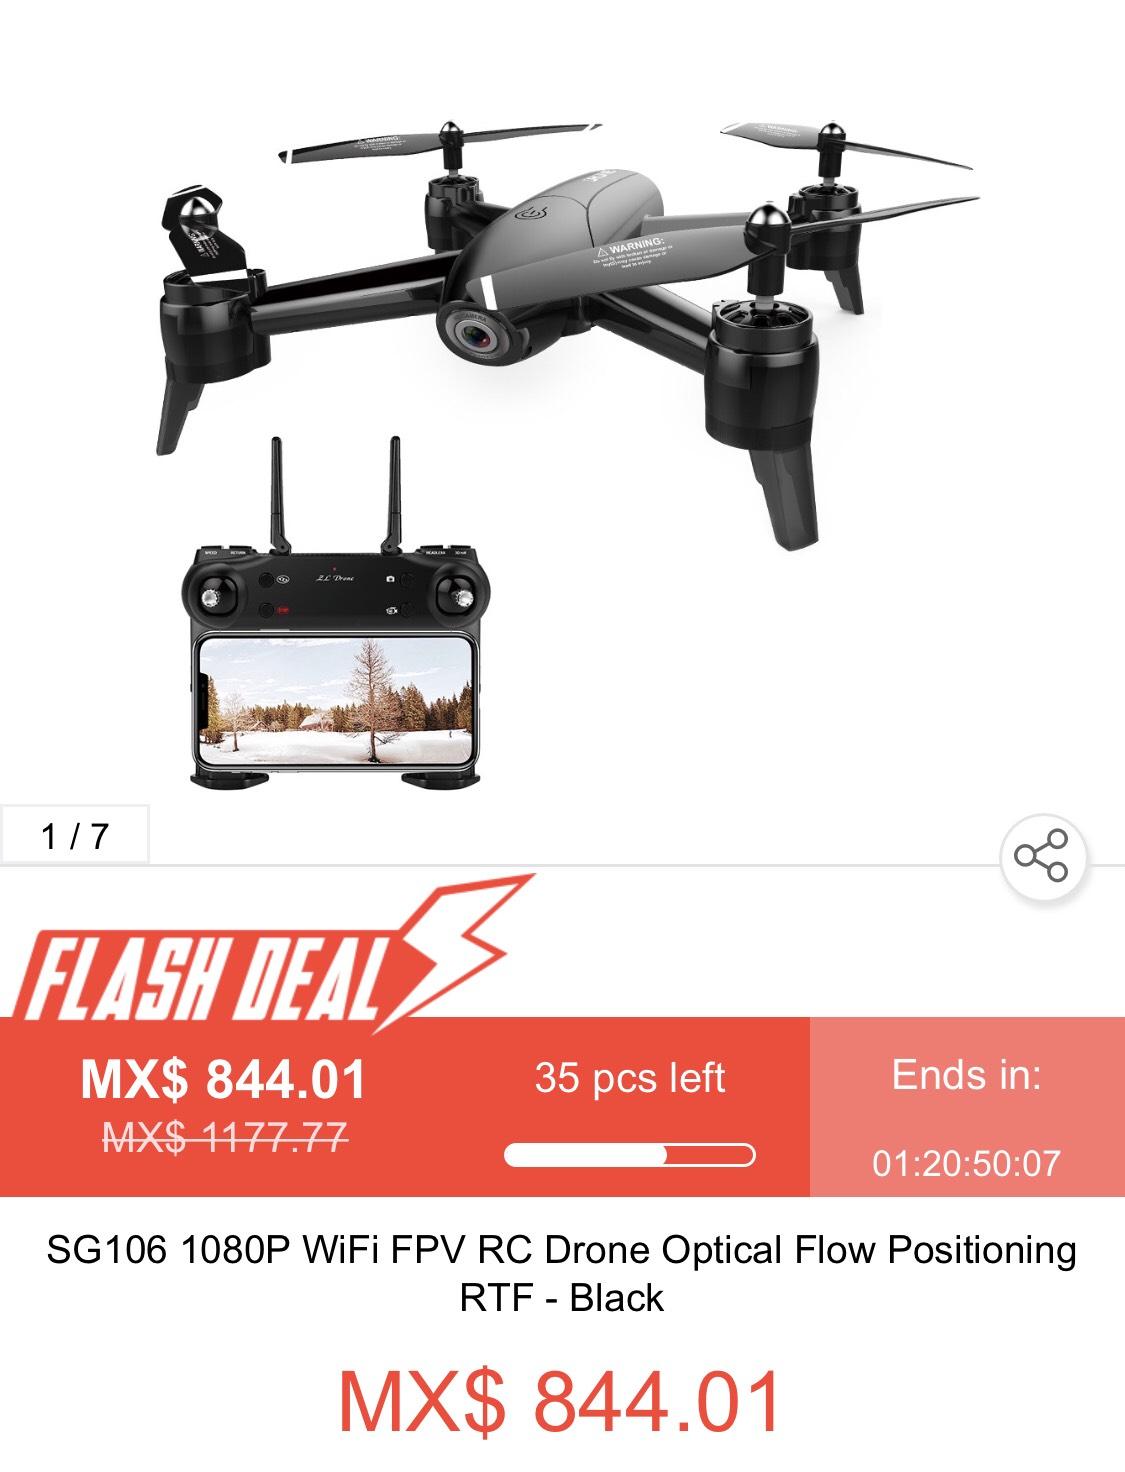 Geekbuying:  SG106 1080P WiFi FPV RC Drone Posicionamiento de flujo óptico RTF - Negro